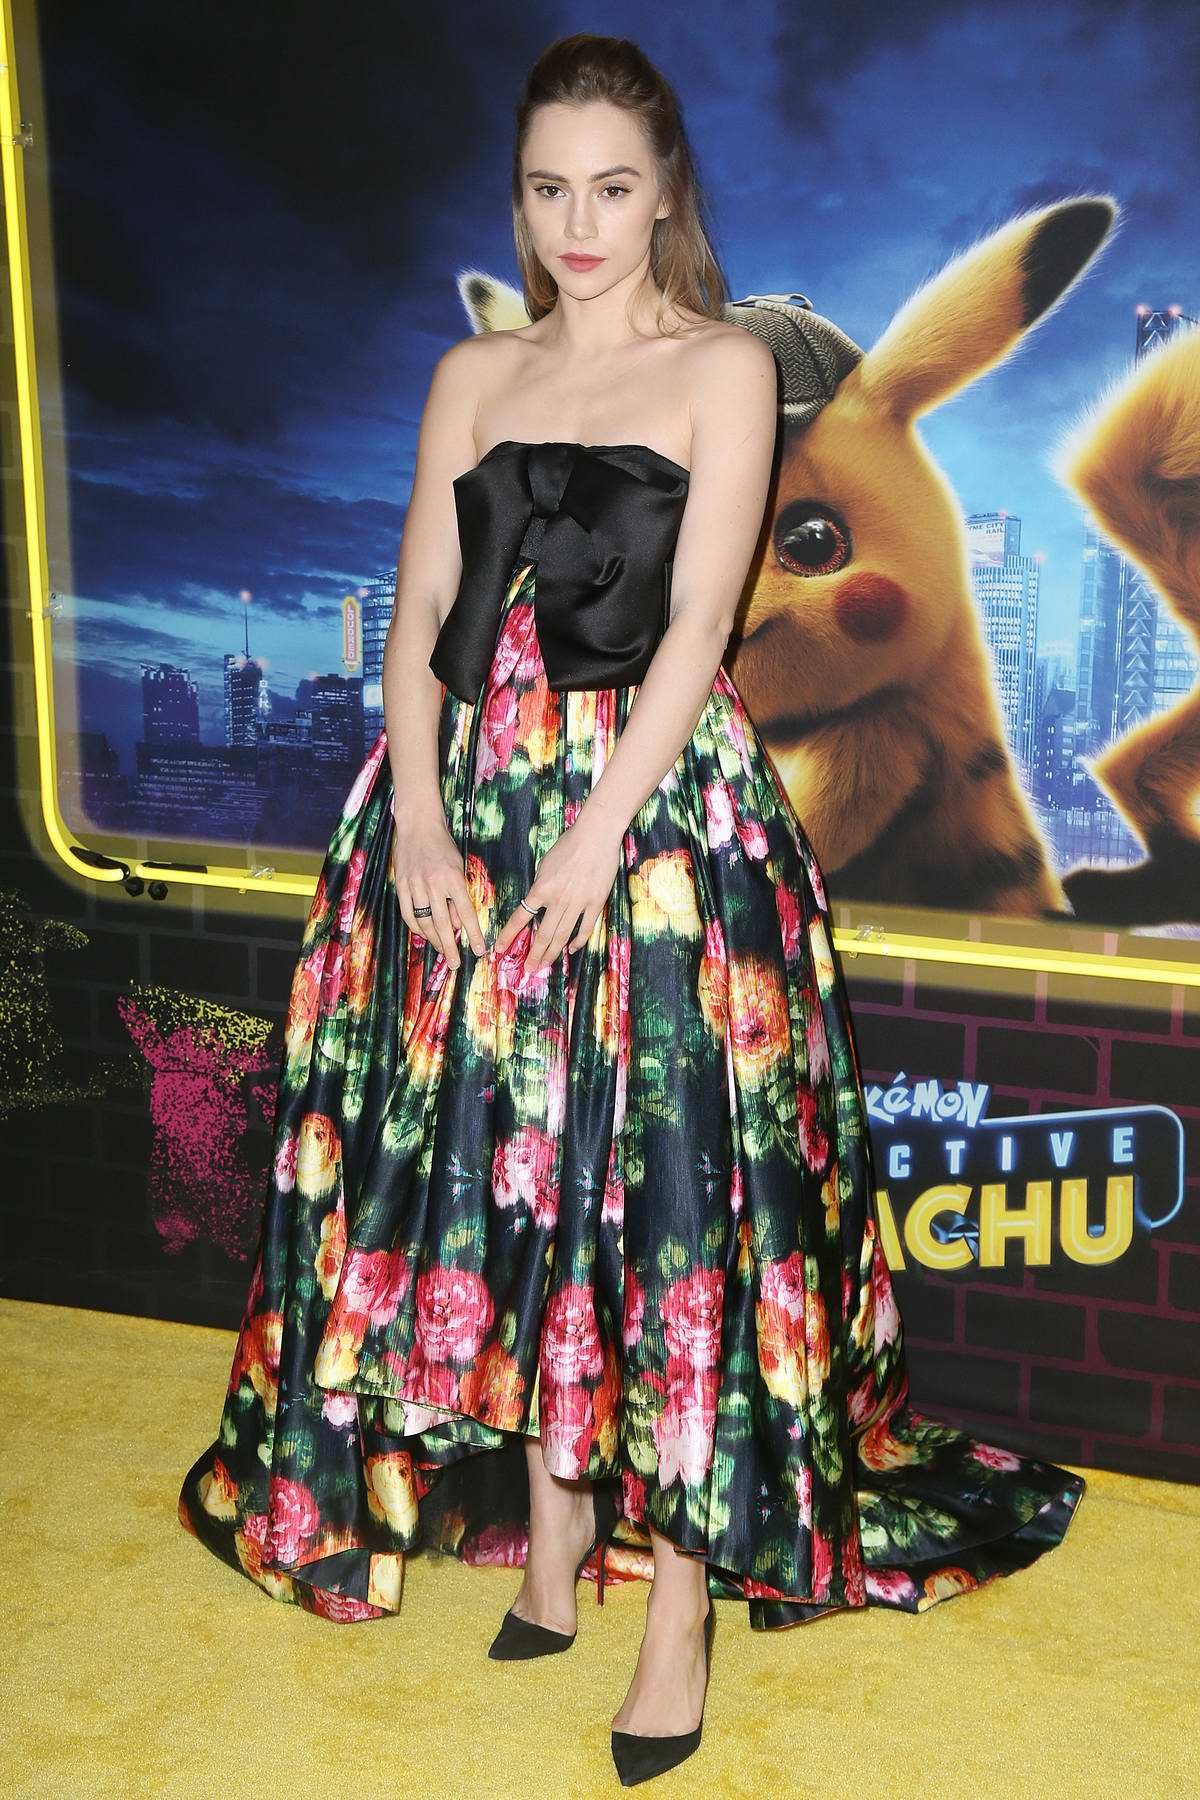 Suki Waterhouse attends 'Pokemon Detective Pikachu' film premiere in New York City